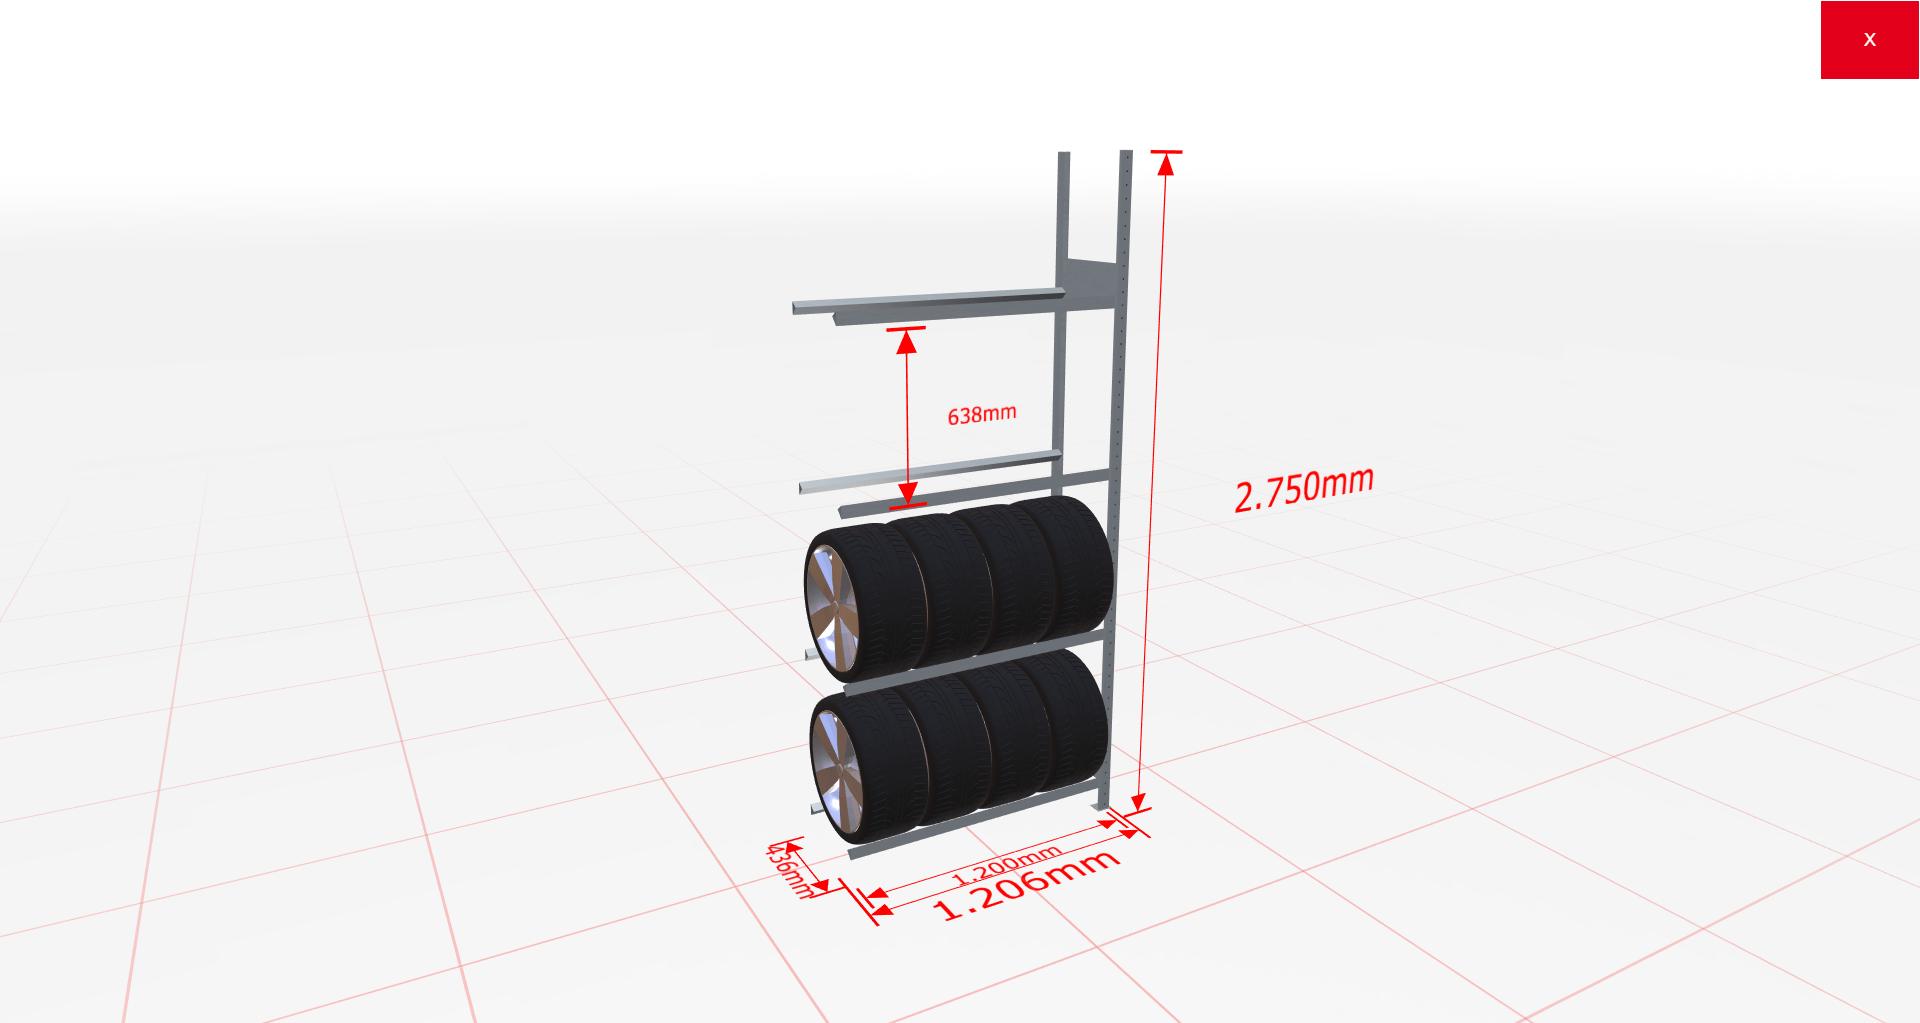 Räderregal Anbauregal SCHULTE Lagertechnik 2750x1200x400 mm – 4 Ebenen á 1200 mm, verzinkt